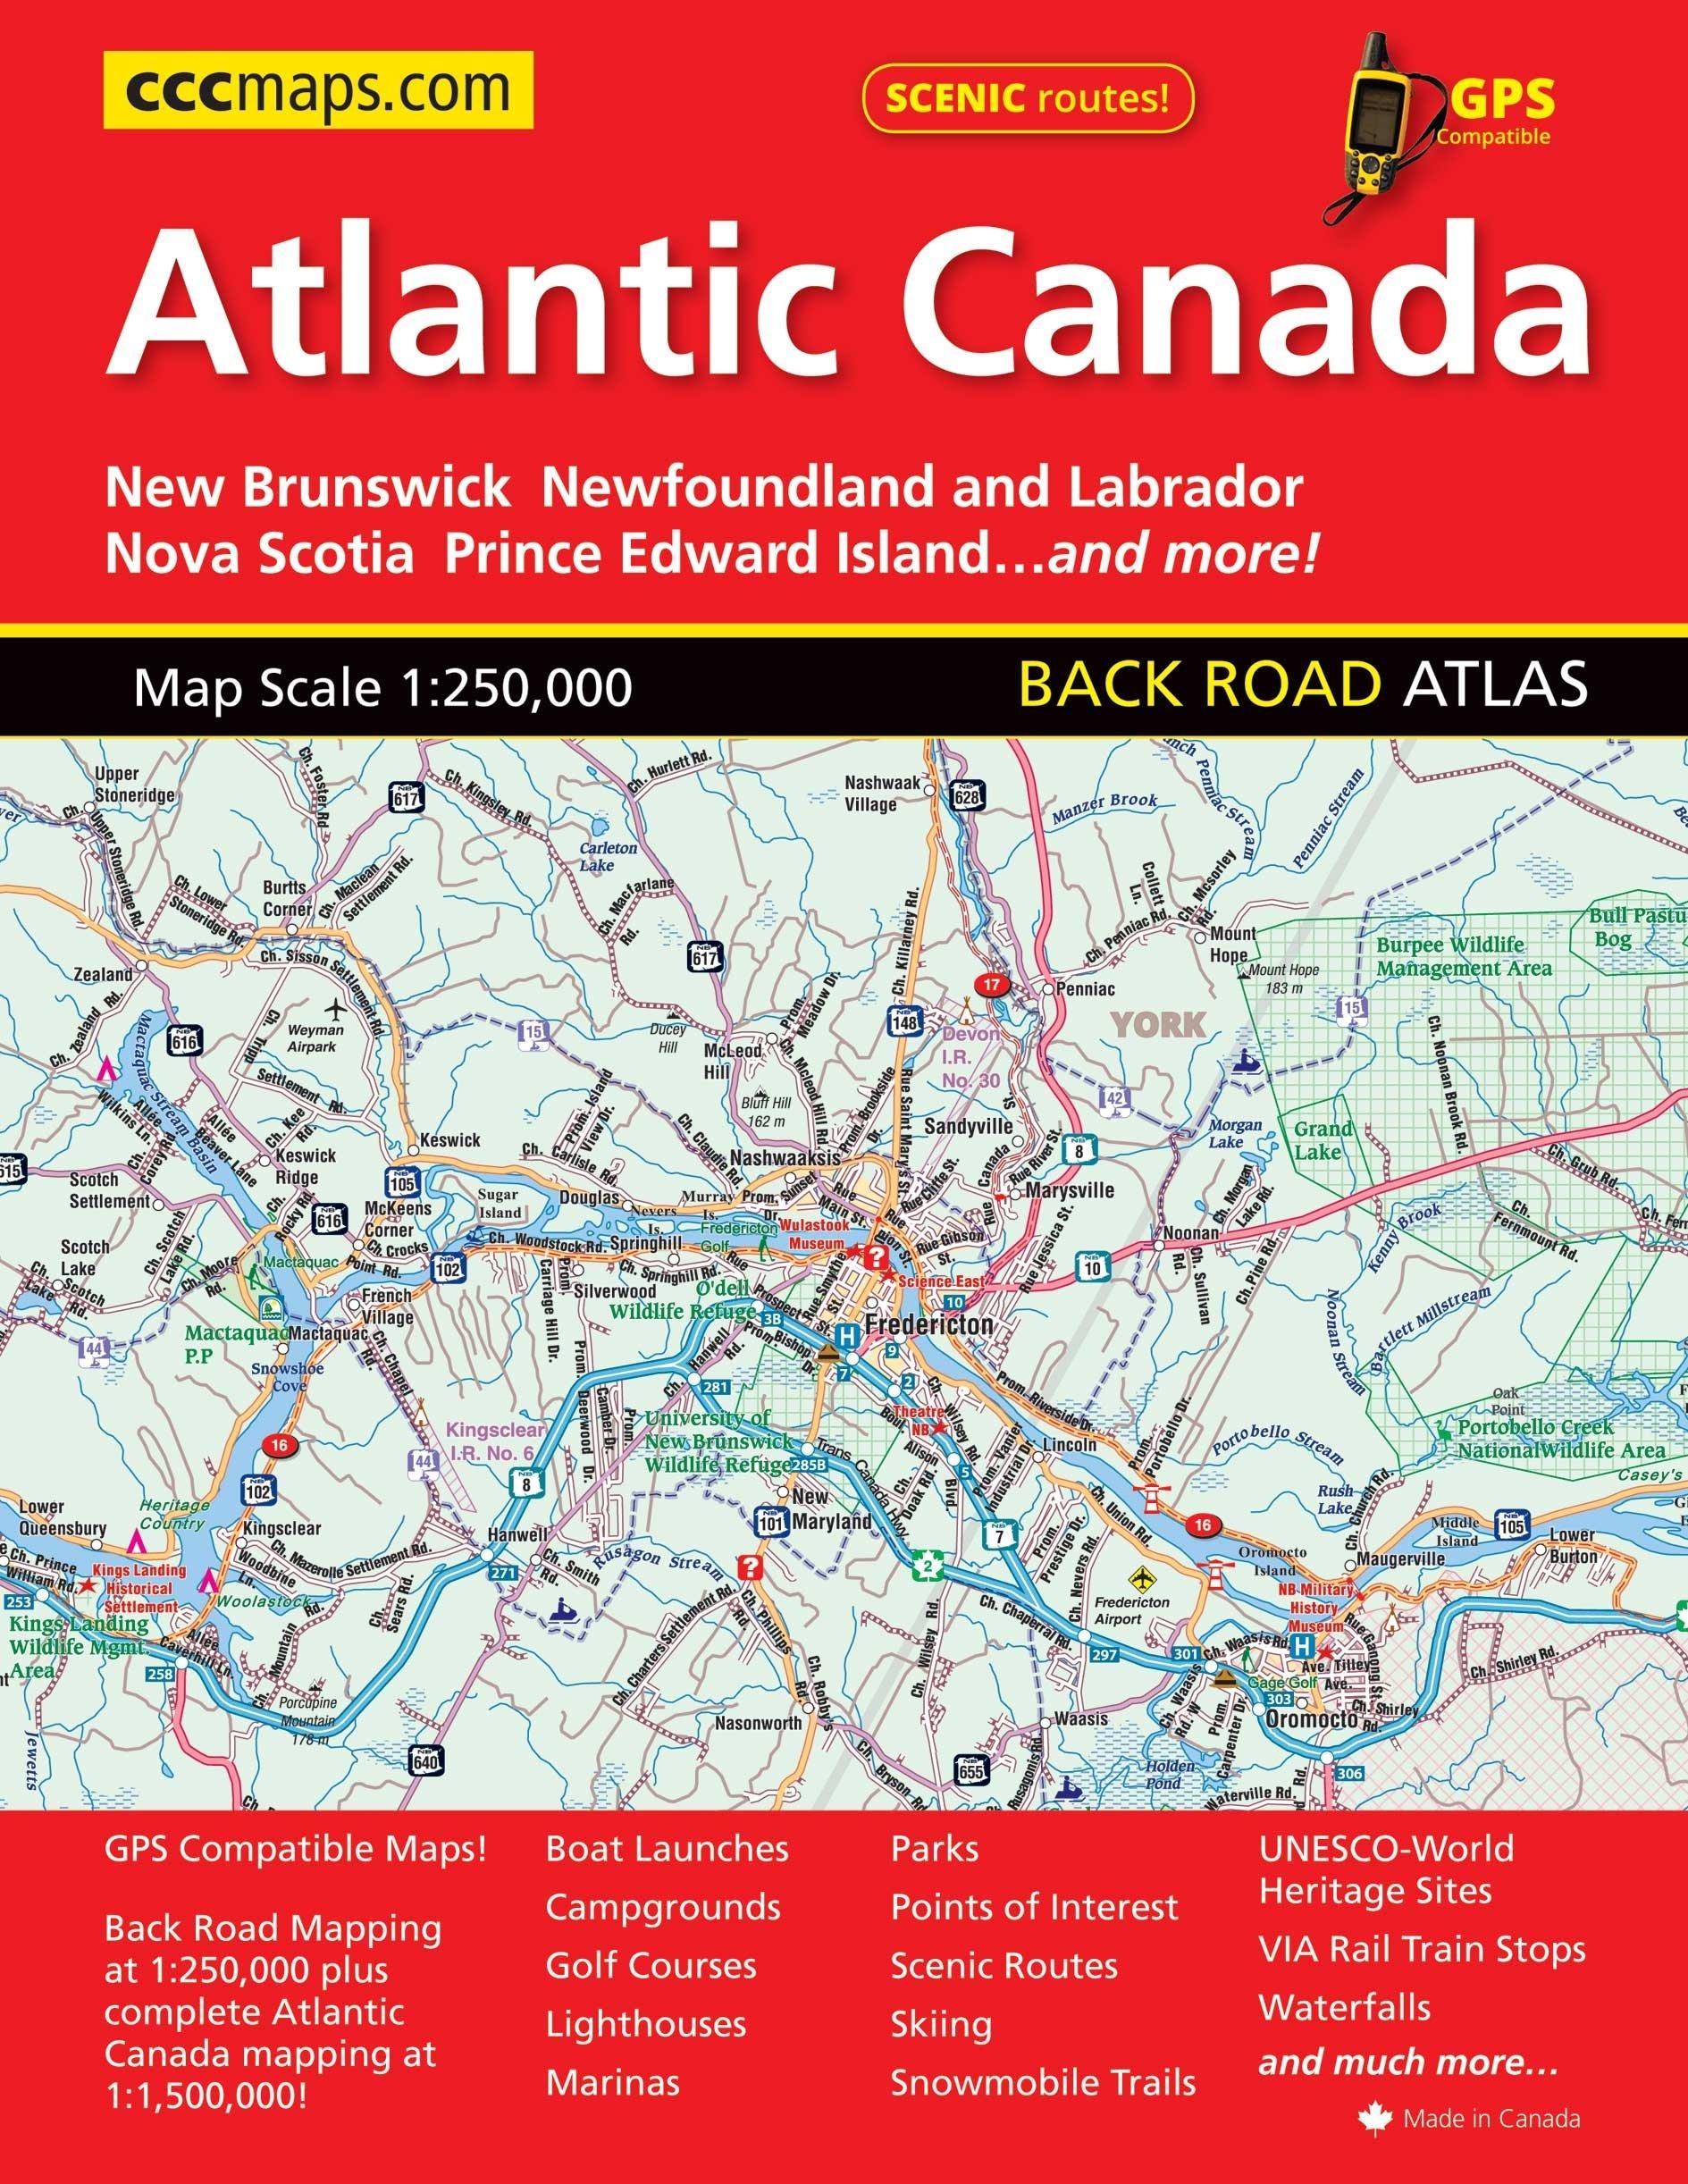 Map Of Canada Nova Scotia.Atlantic Canada Back Road Atlas Mapart Publishing Mapart